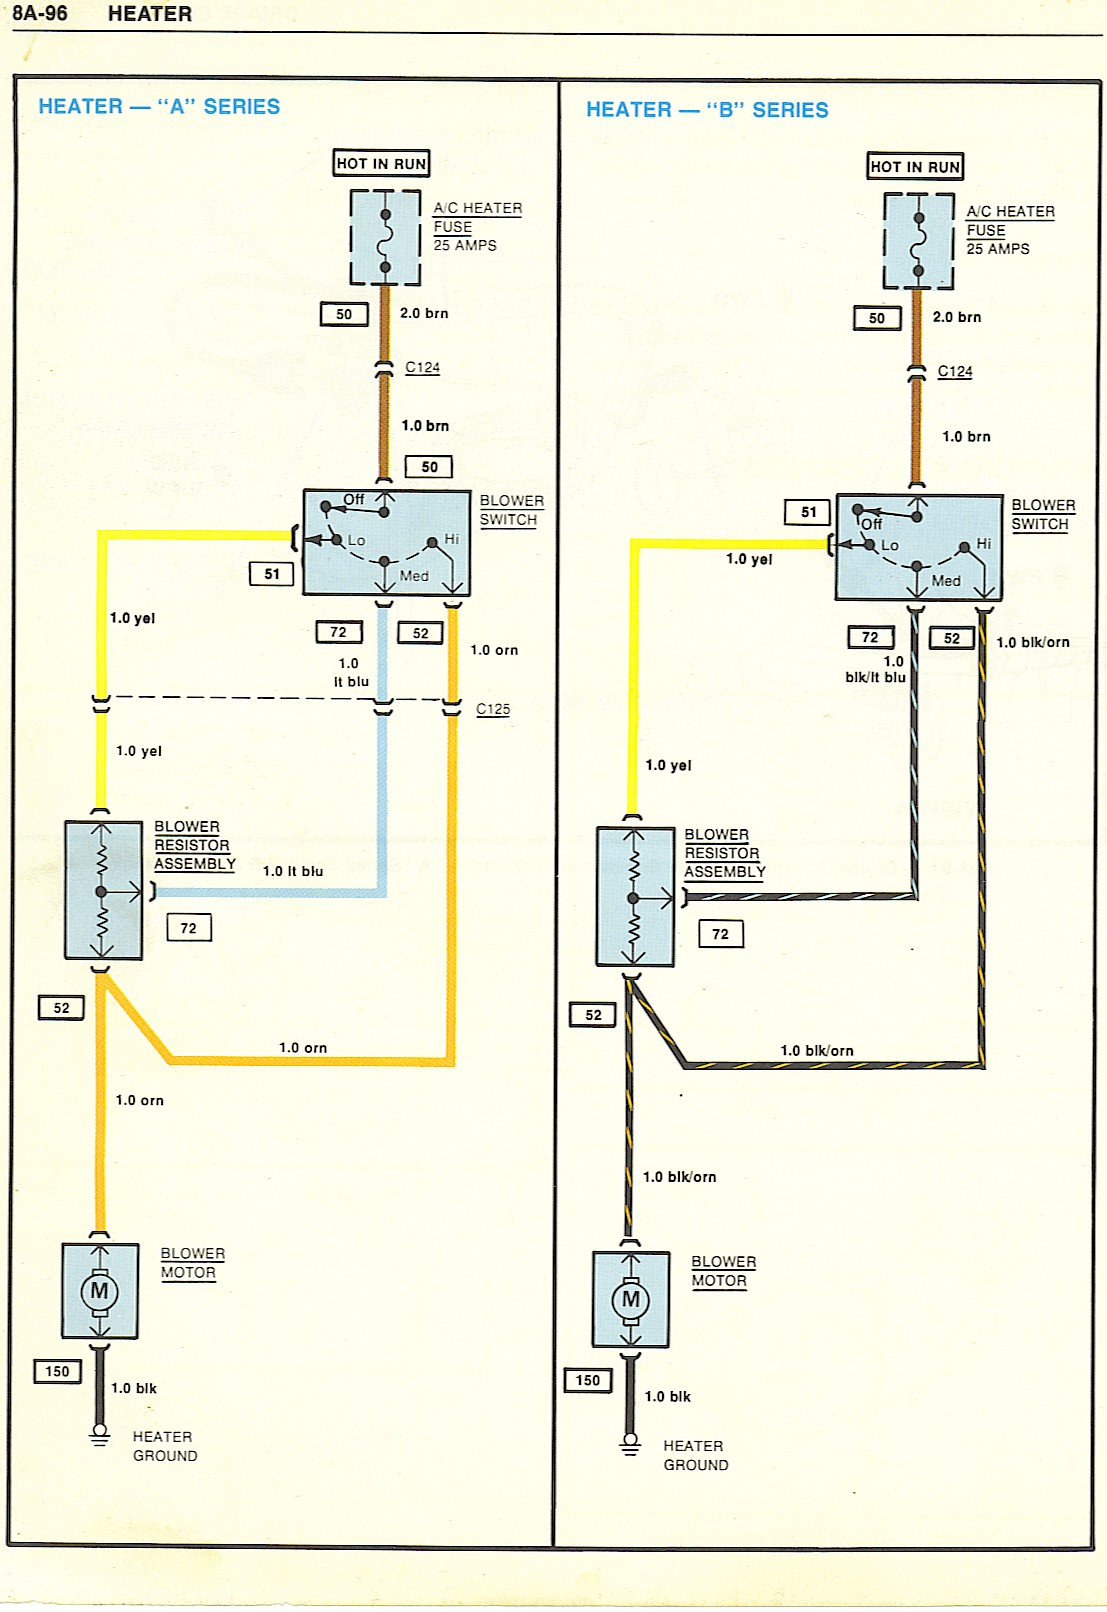 Heater?resize=665%2C968 afi 500 wiper motor wiring diagram afi 2000 wiper motor afi marine wiper motor wiring diagram at reclaimingppi.co